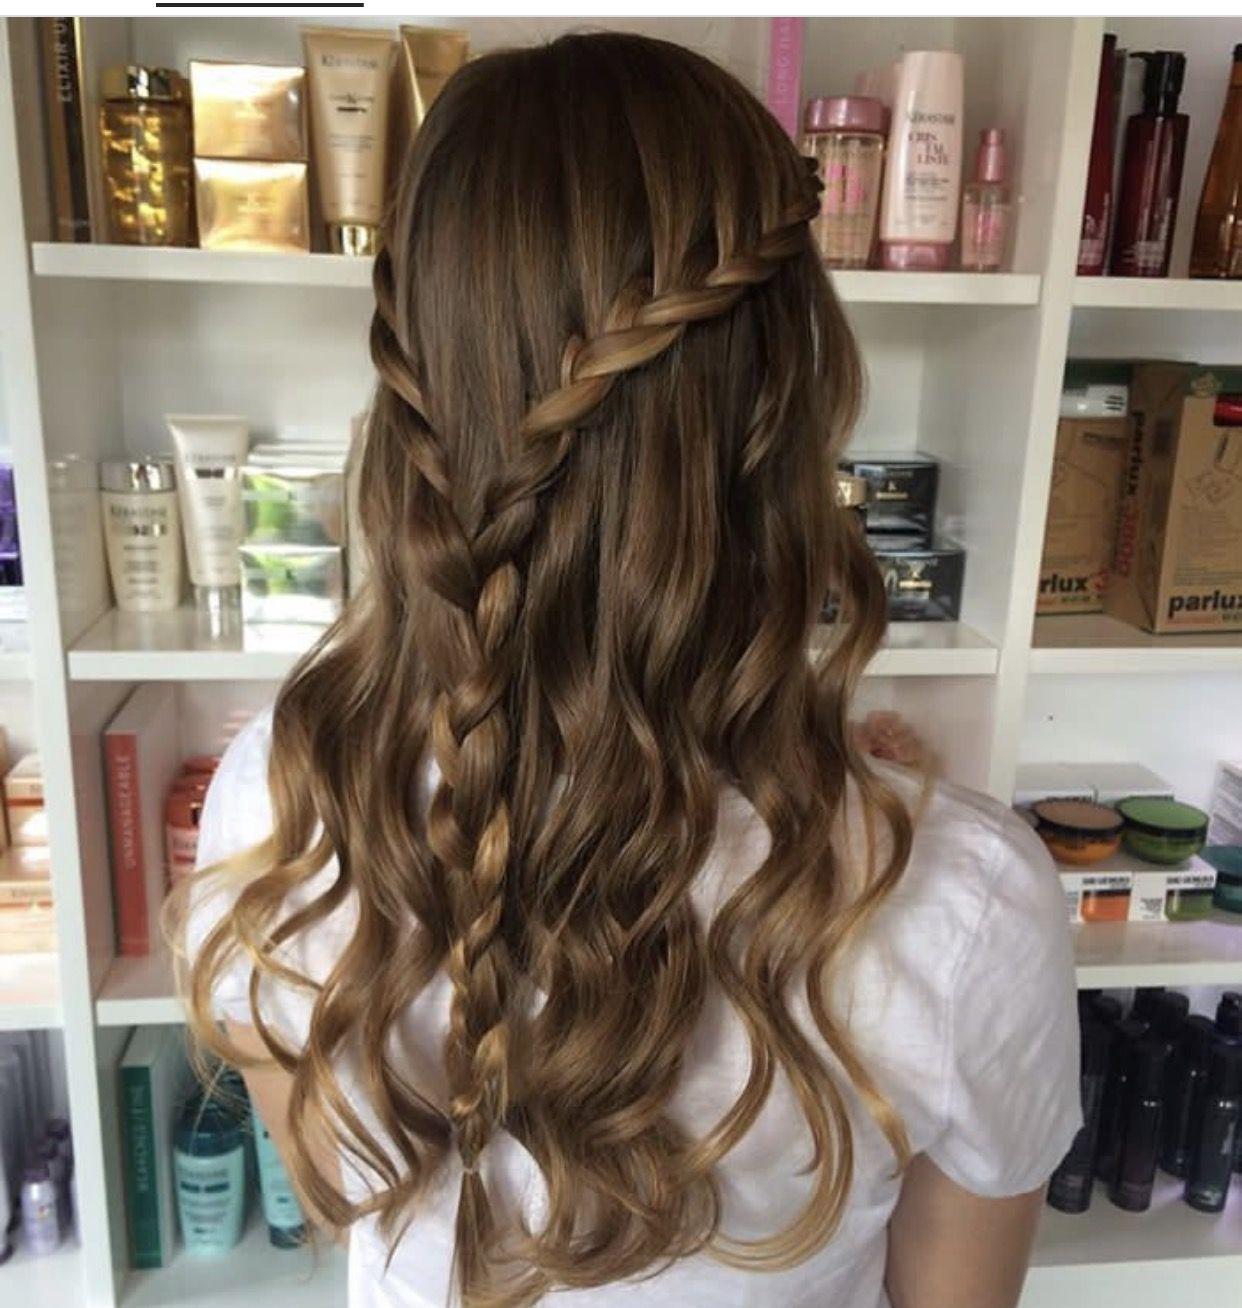 Pin by beth delmonte on long hair ideas pinterest